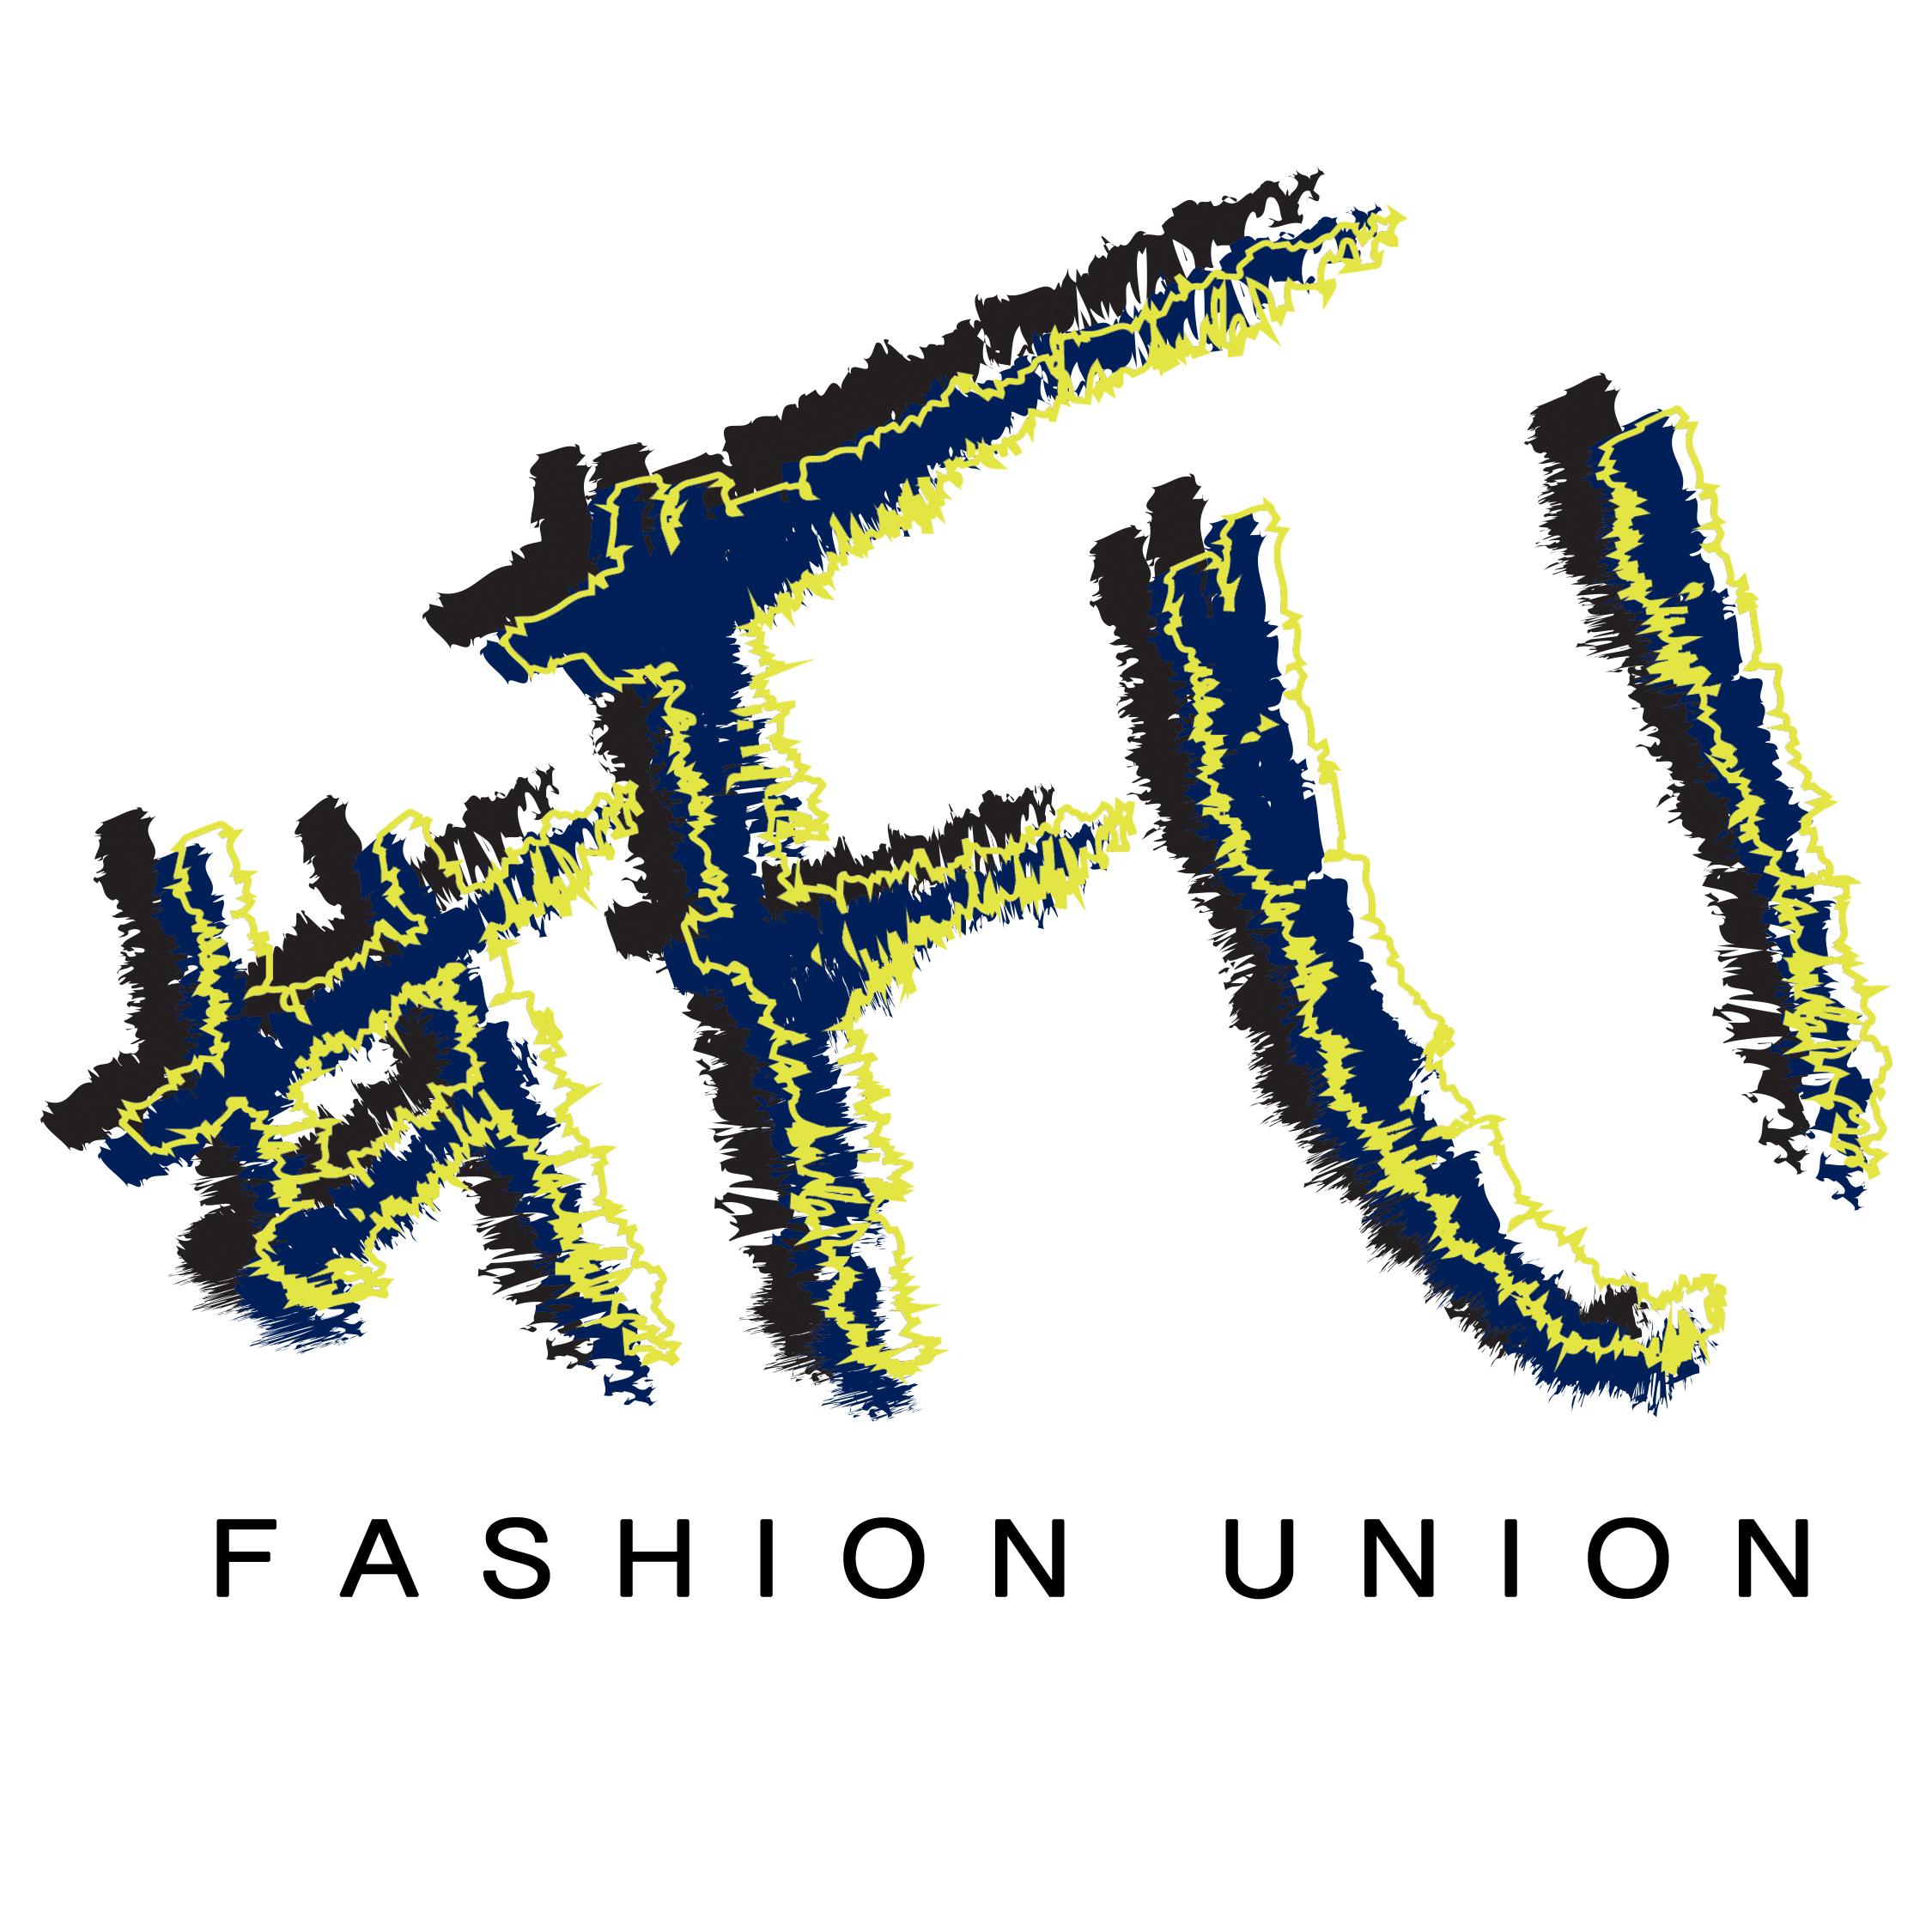 Fashion Course Union